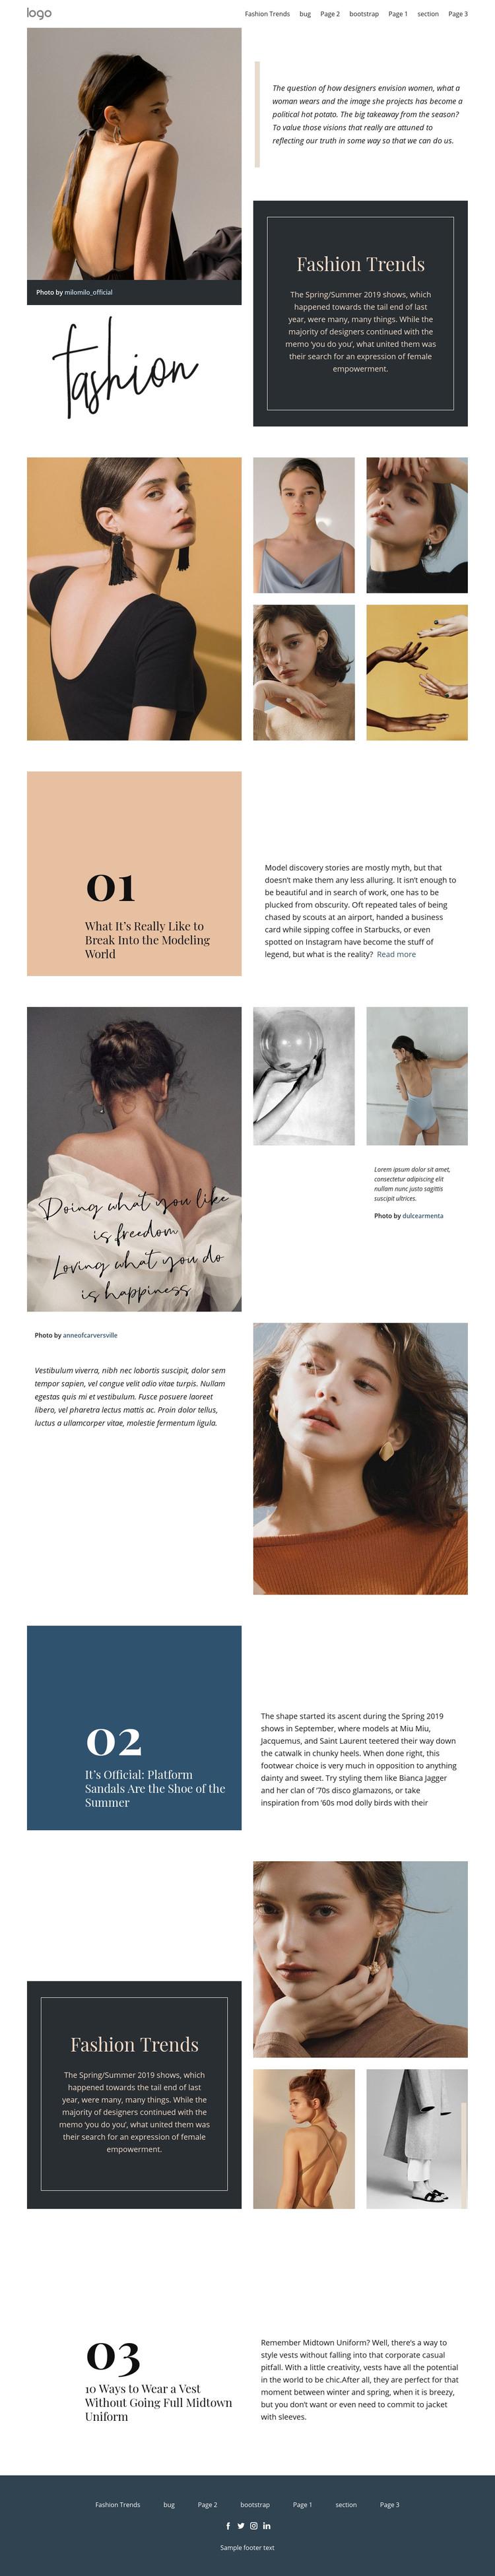 Designer vision of fashion WordPress Website